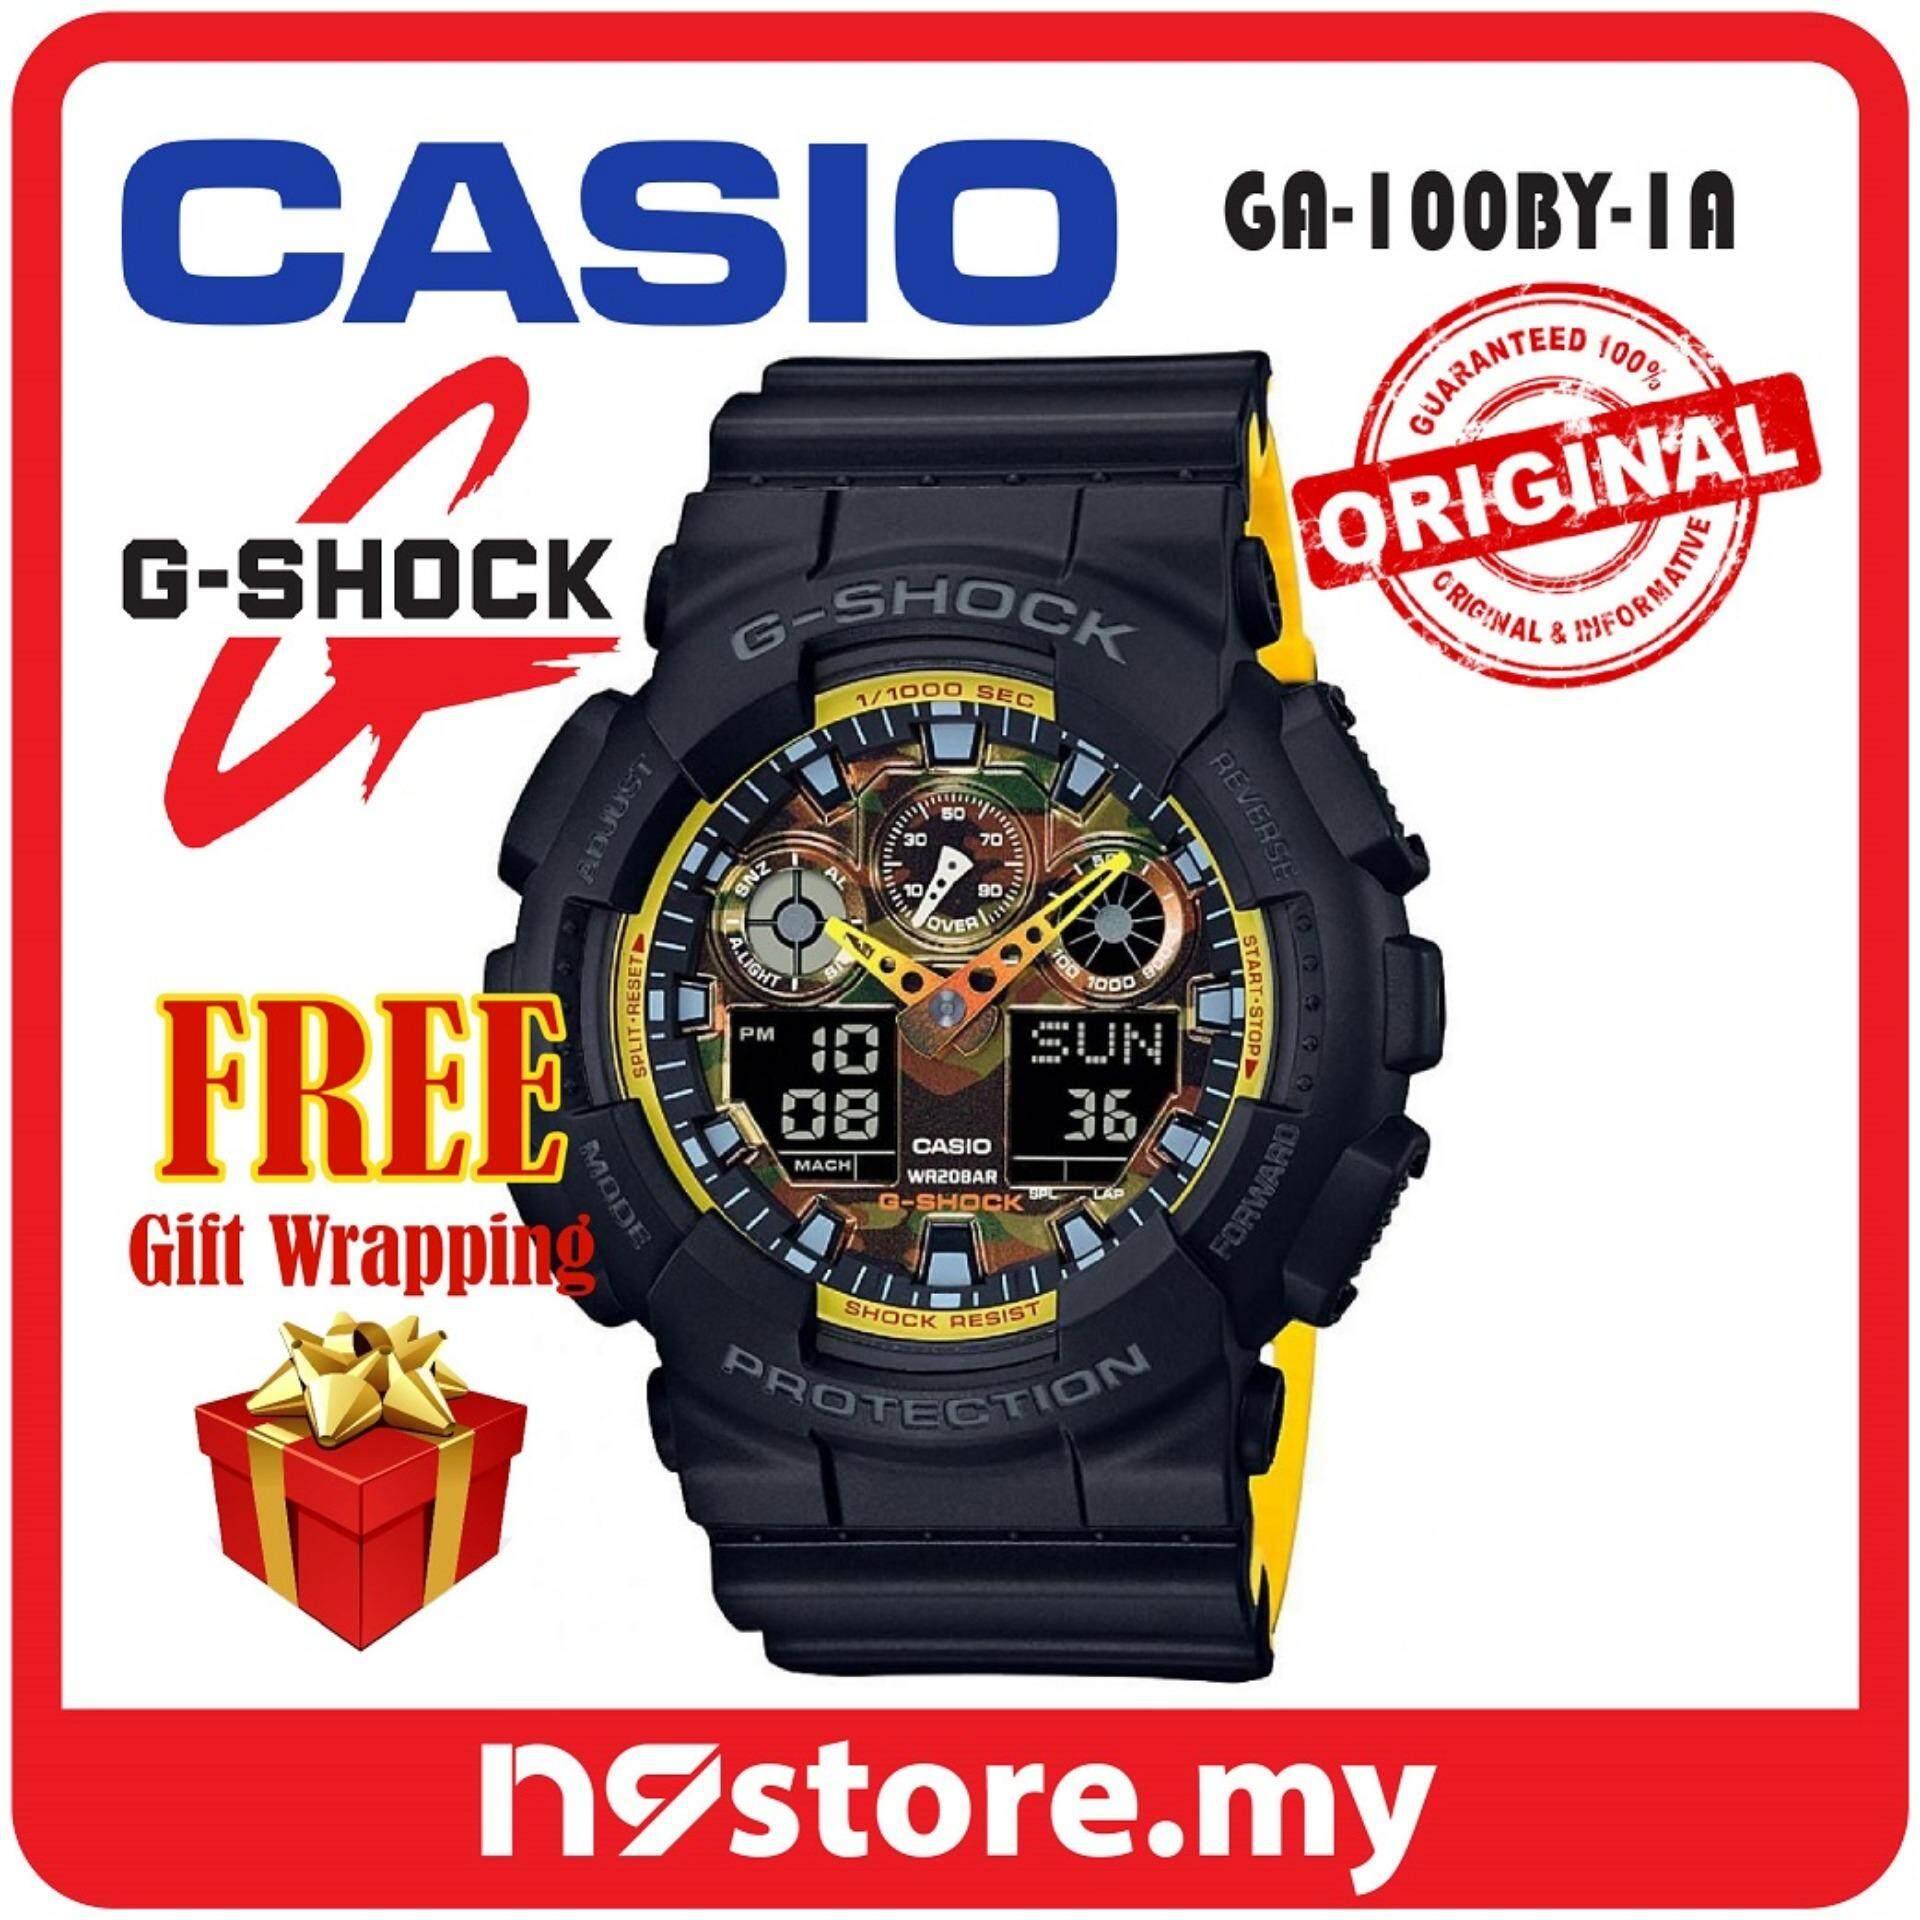 Casio G-Shock GA-100BY-1A Analog Digital Sports Watch